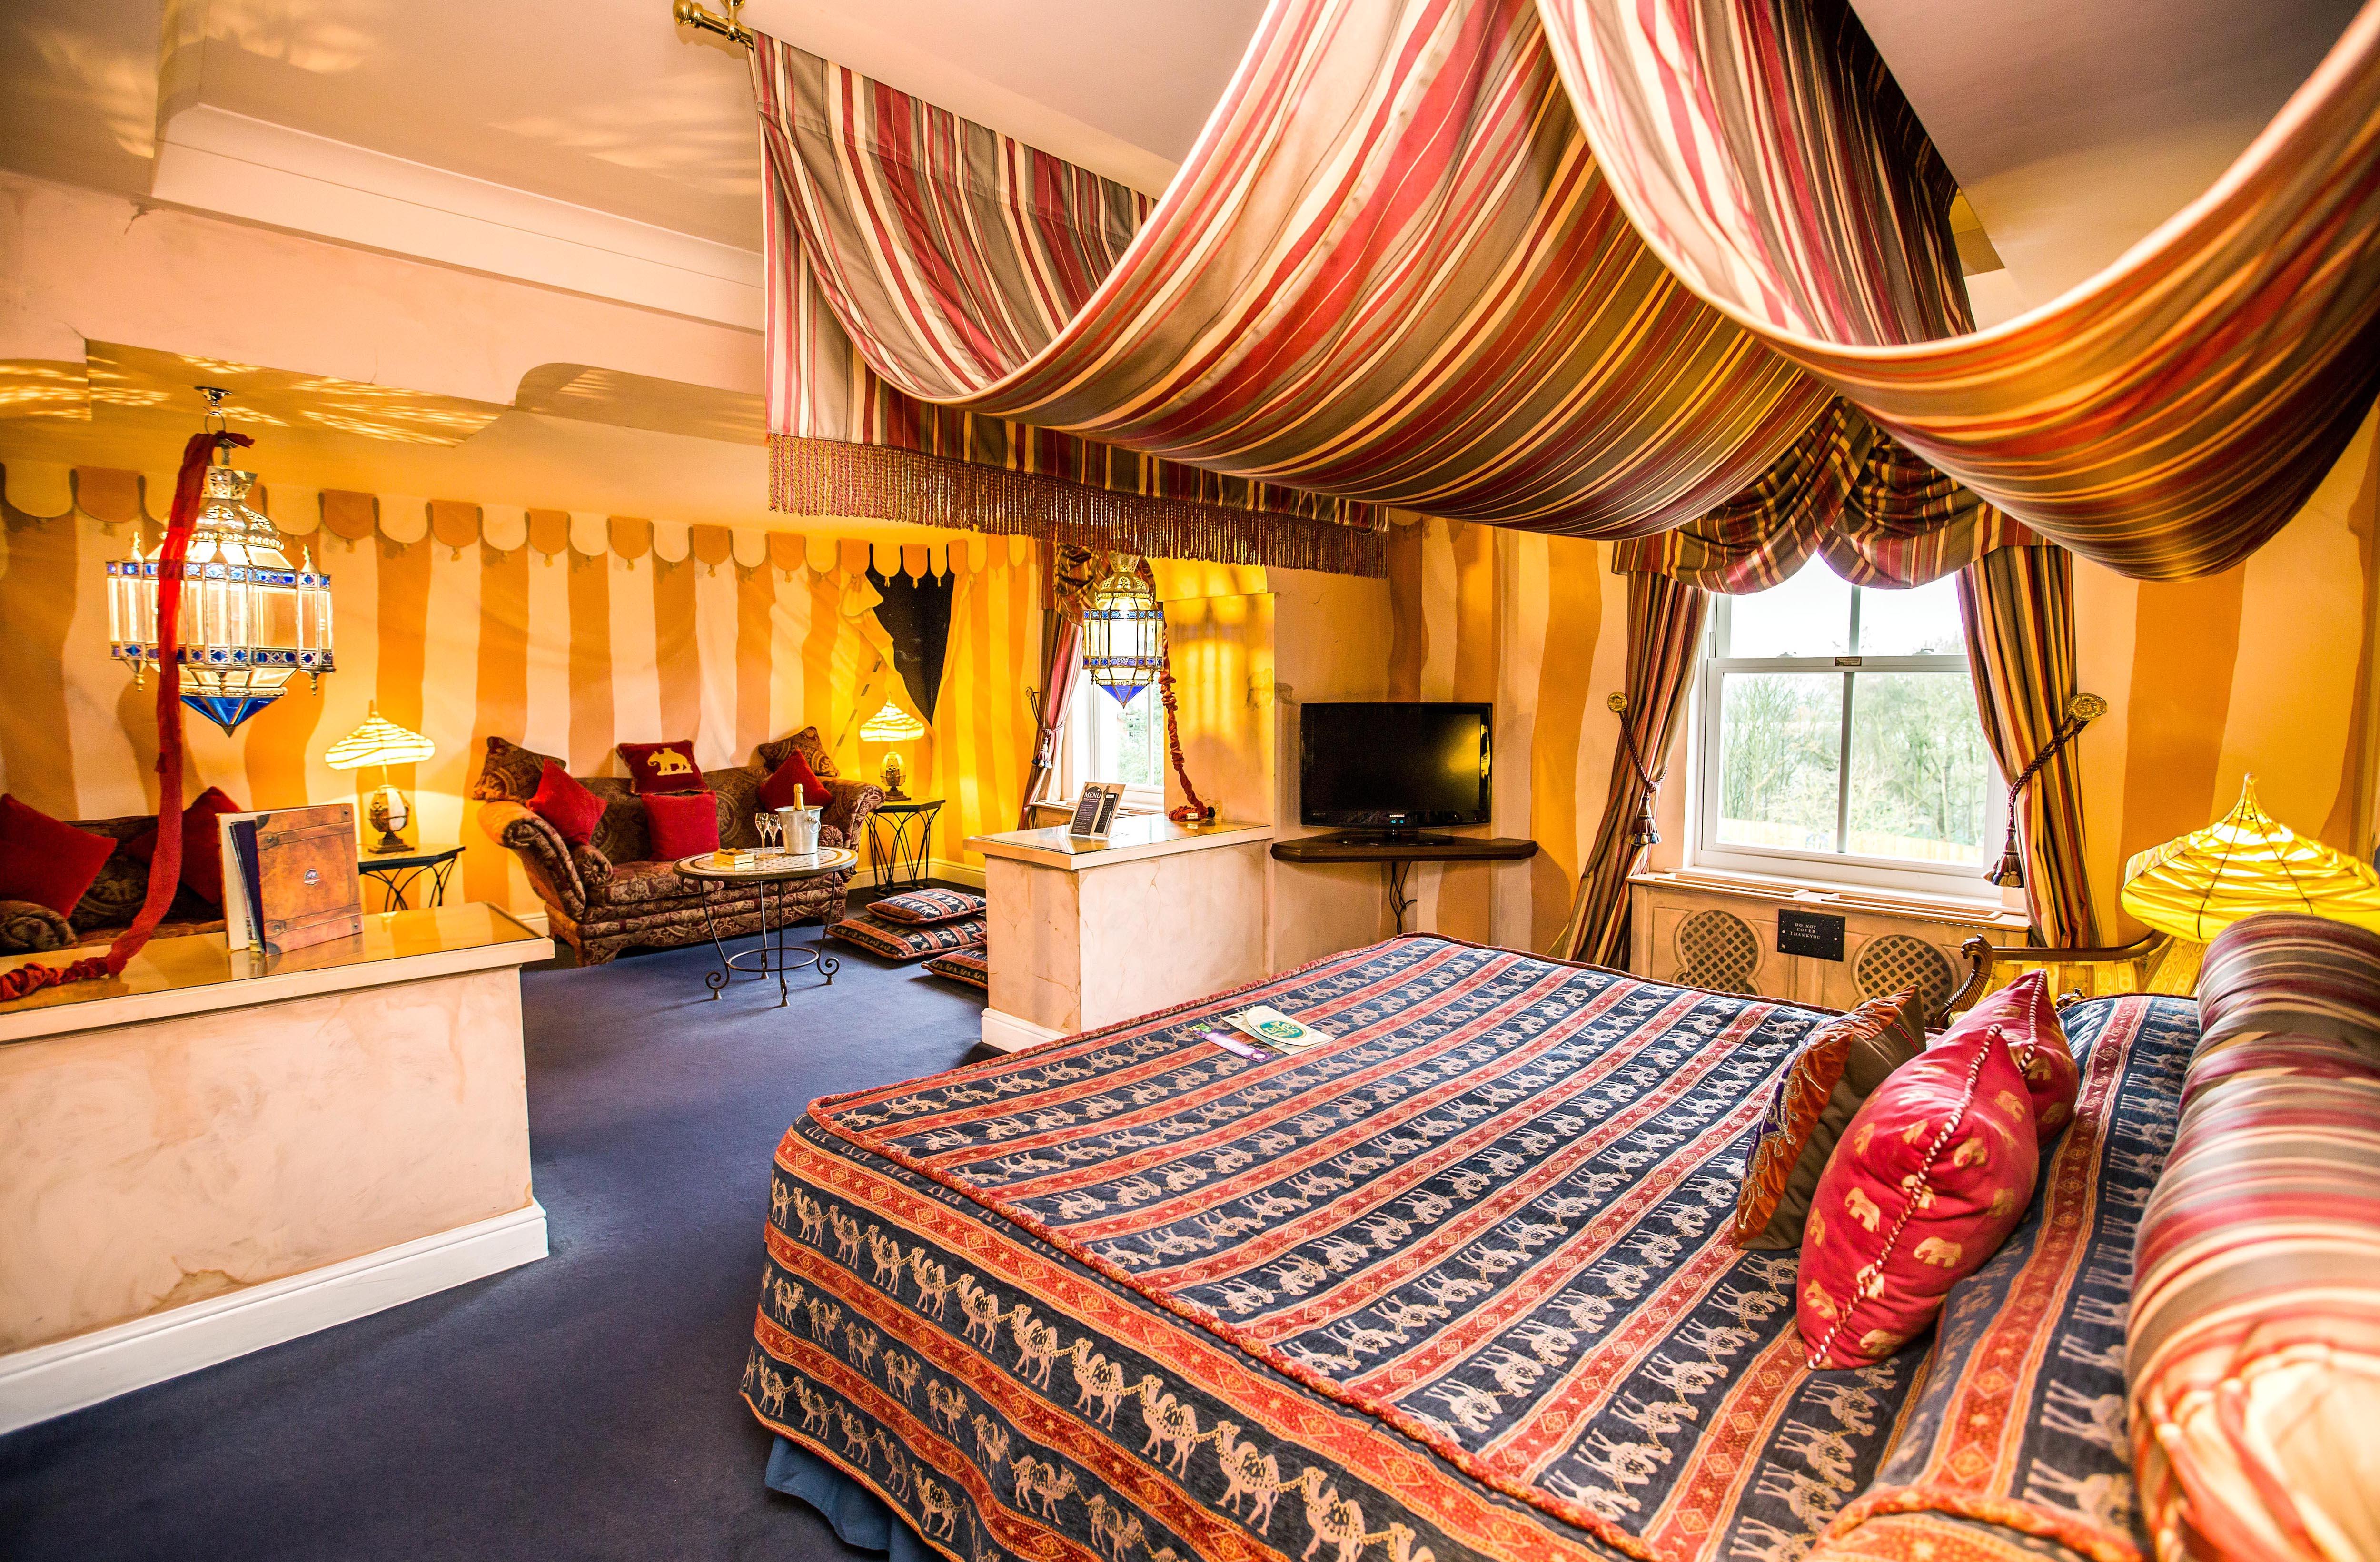 Arabian Nights Room Towerstimes